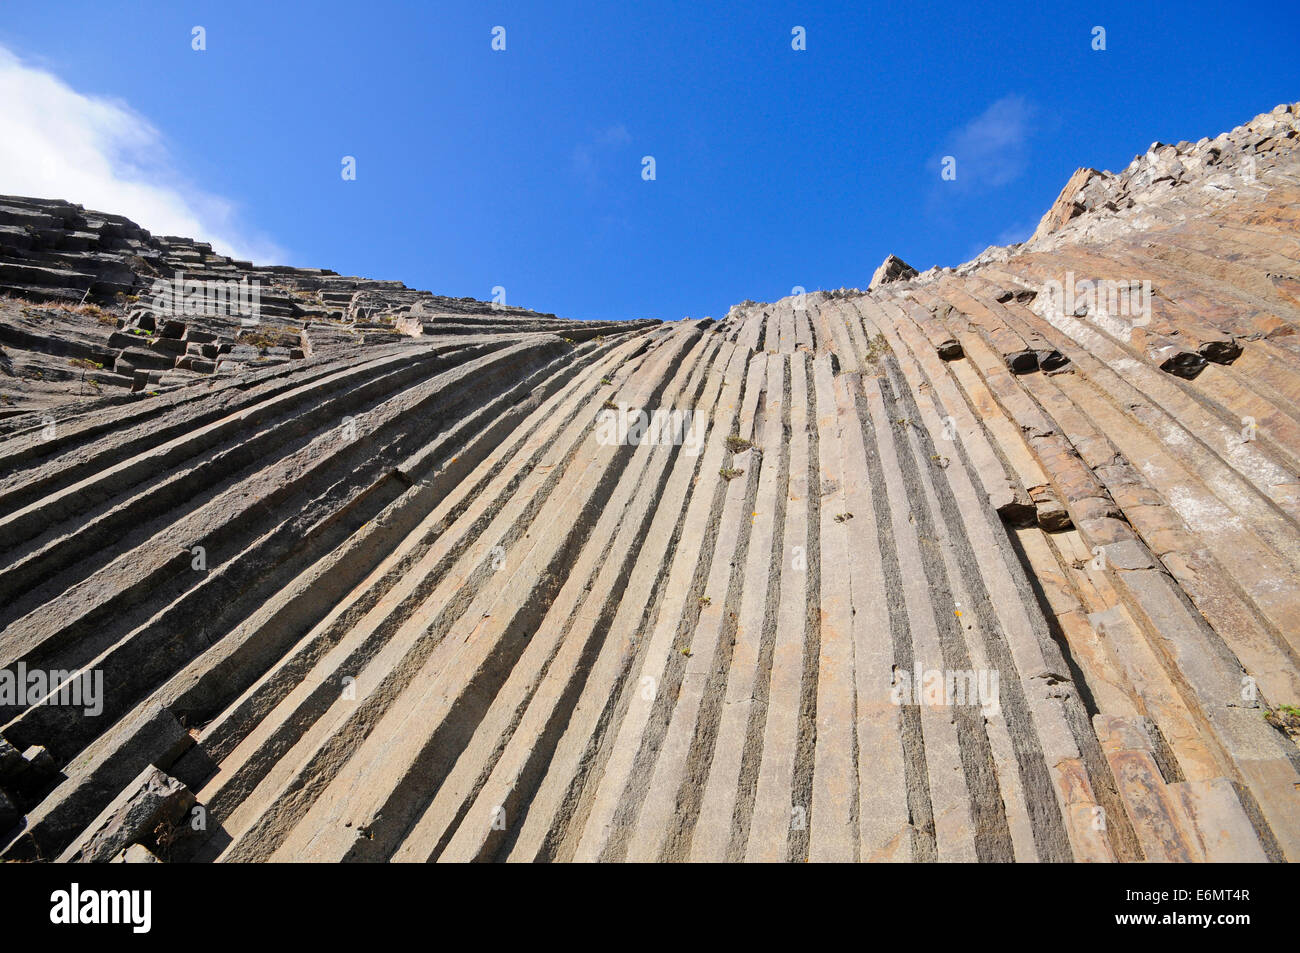 volcanic exagonal columns - Stock Image